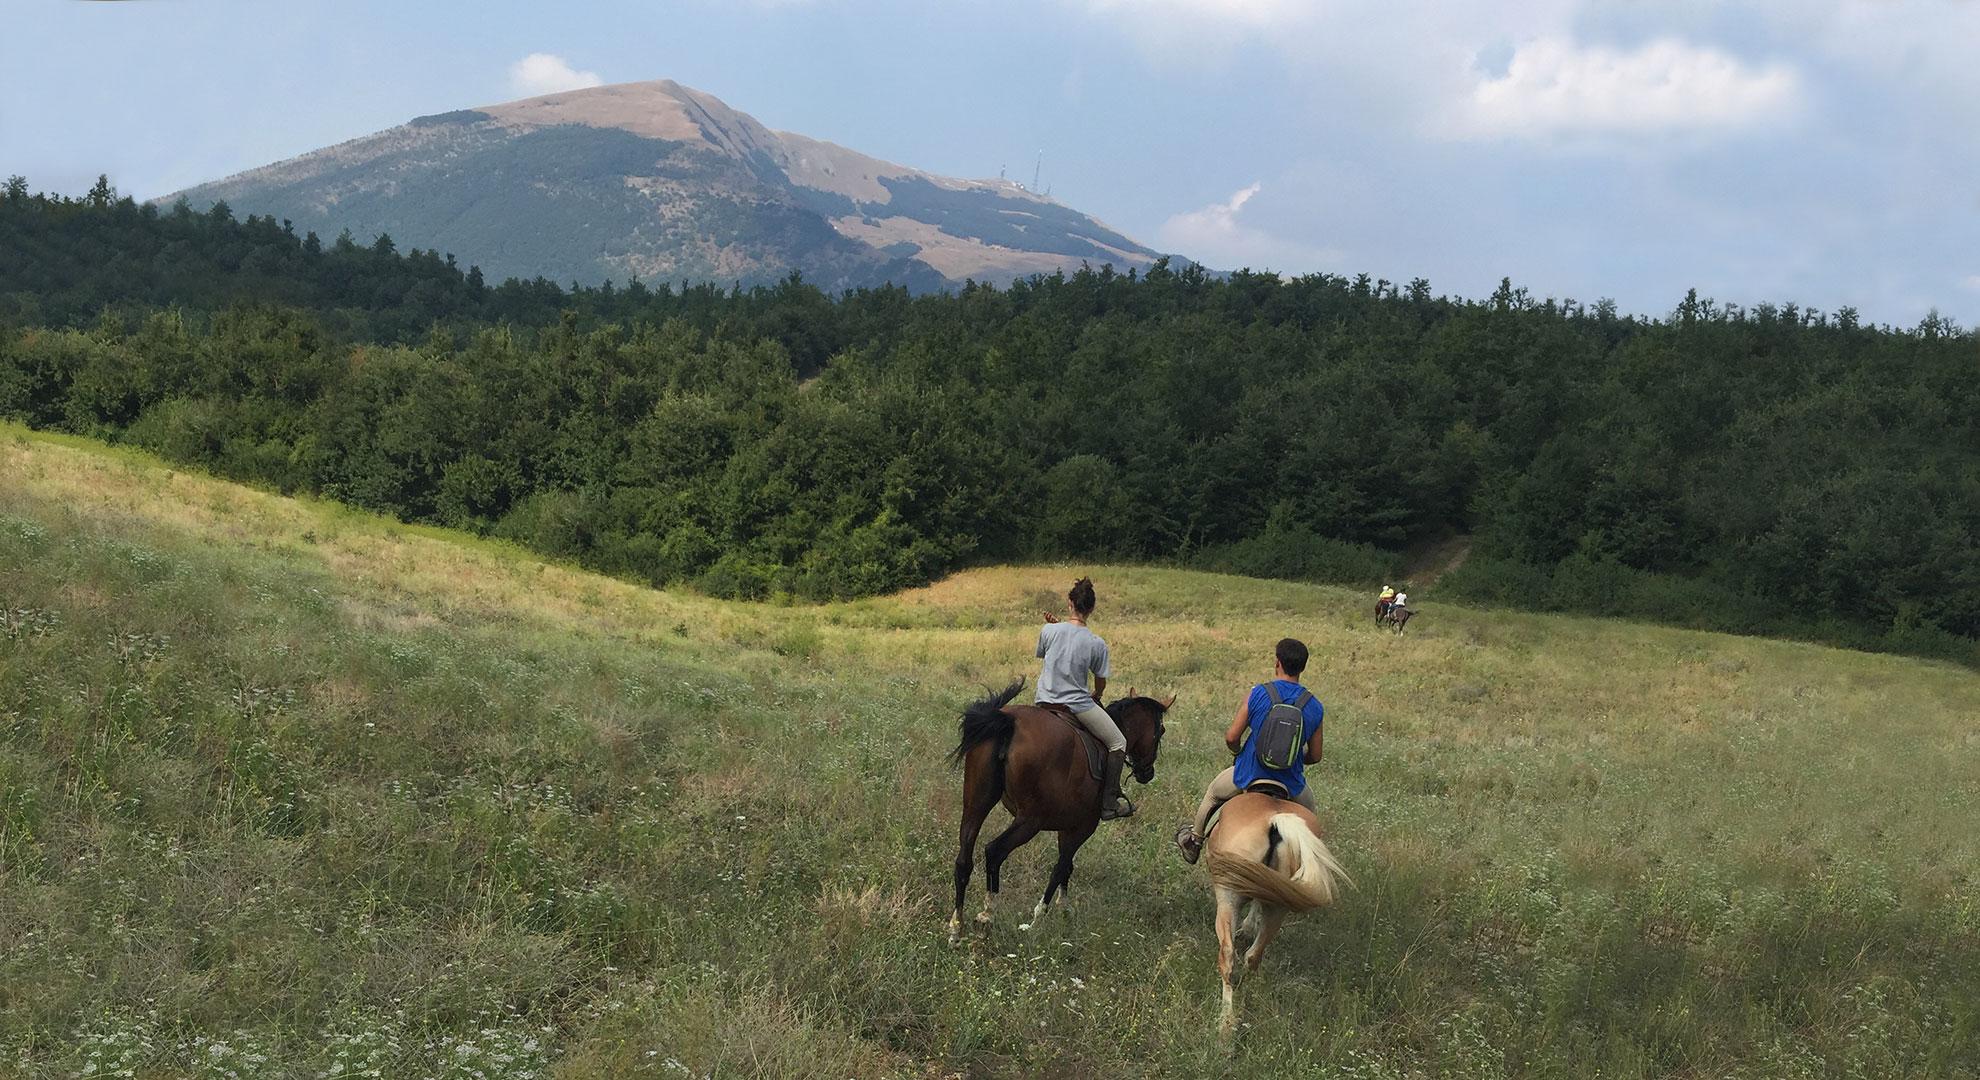 turismo-equestre-umbria-passeggiata-a-cavallo